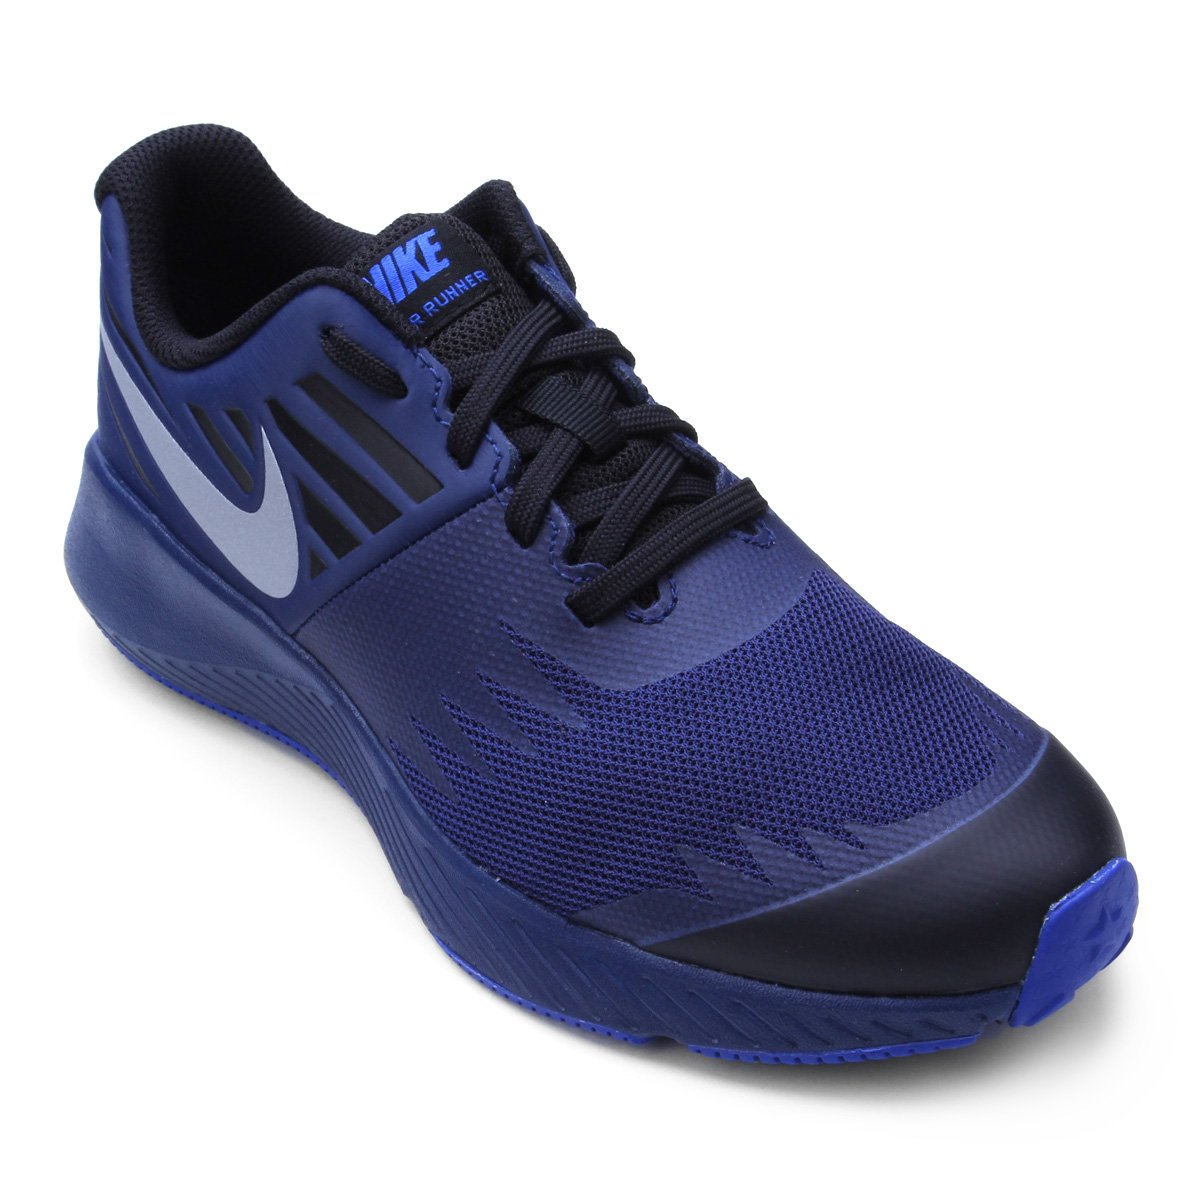 Tênis Infantil Nike Star Runner Masculino - Azul - Compre Agora ... 1e9c086f813b9